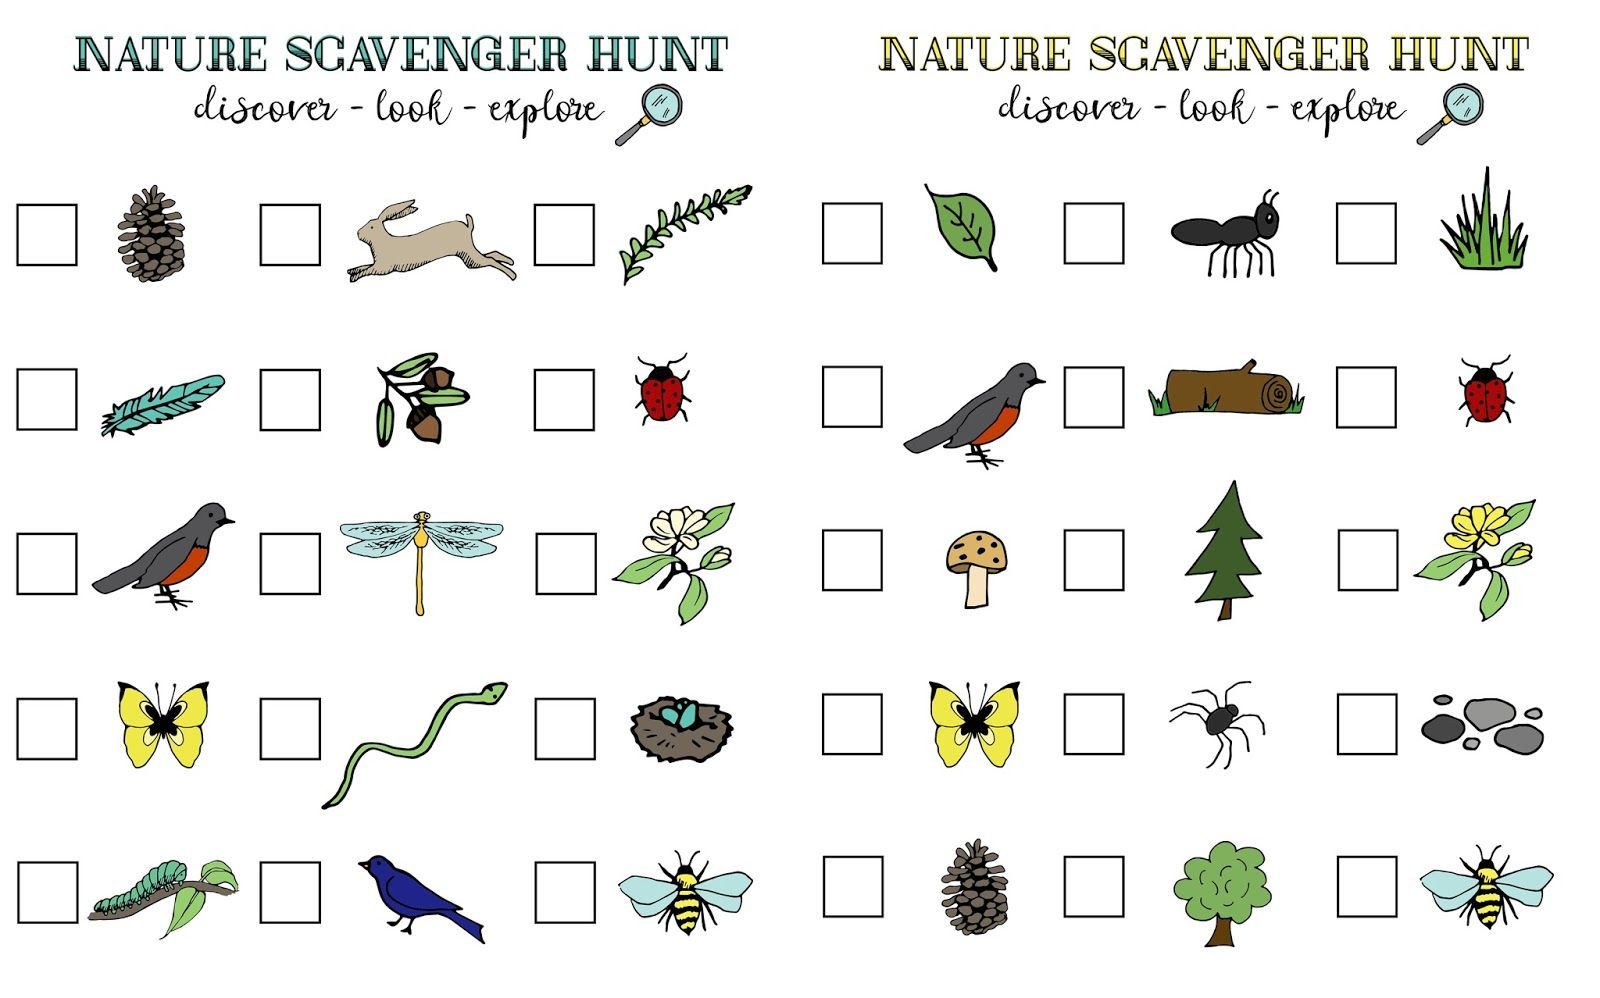 Nature Scavenger Hunt And Summer Adventures